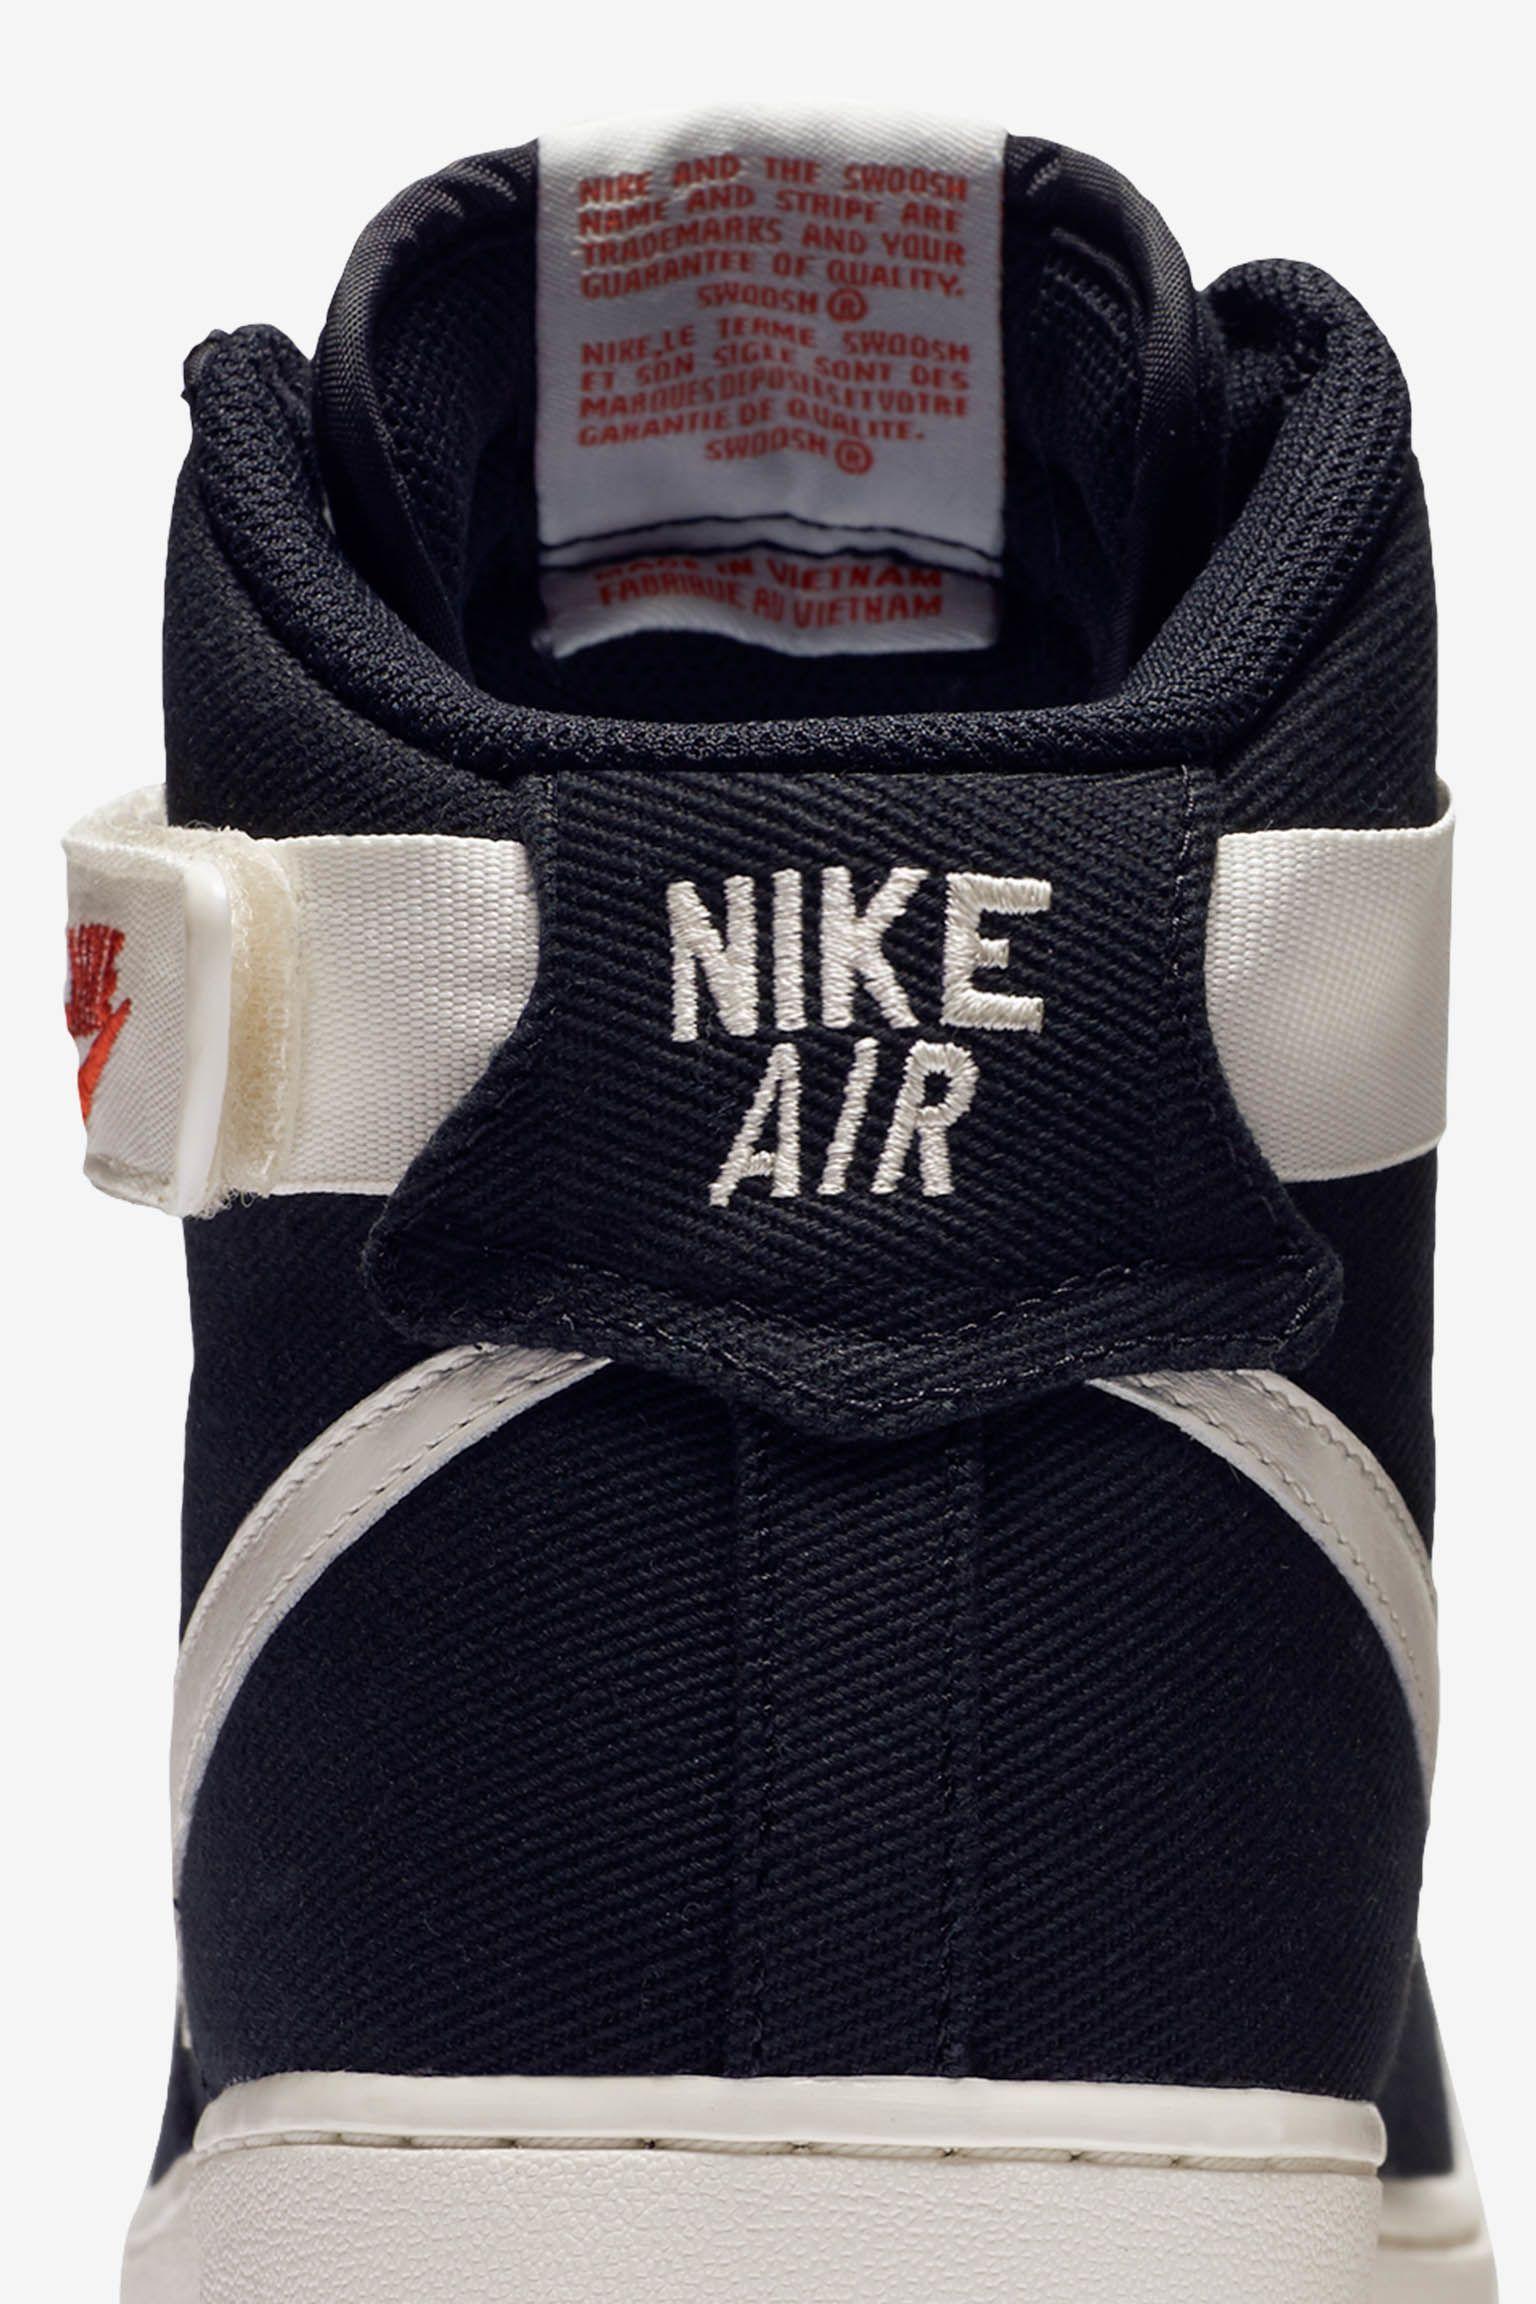 Nike Air Force 1 'Traditonal Textile'